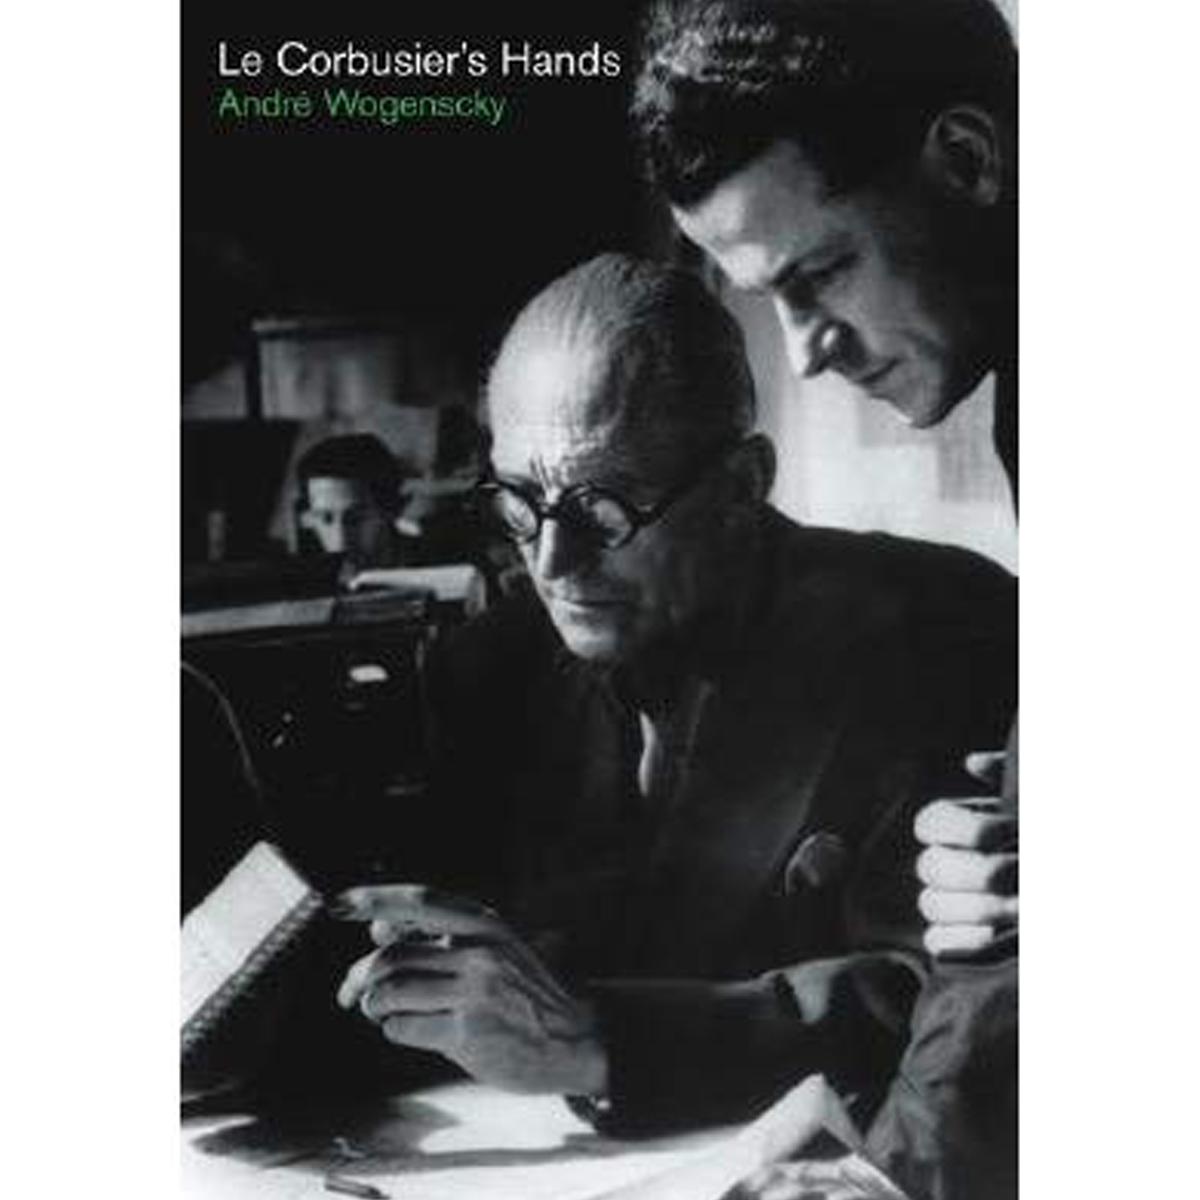 Le Corbusier's Hands